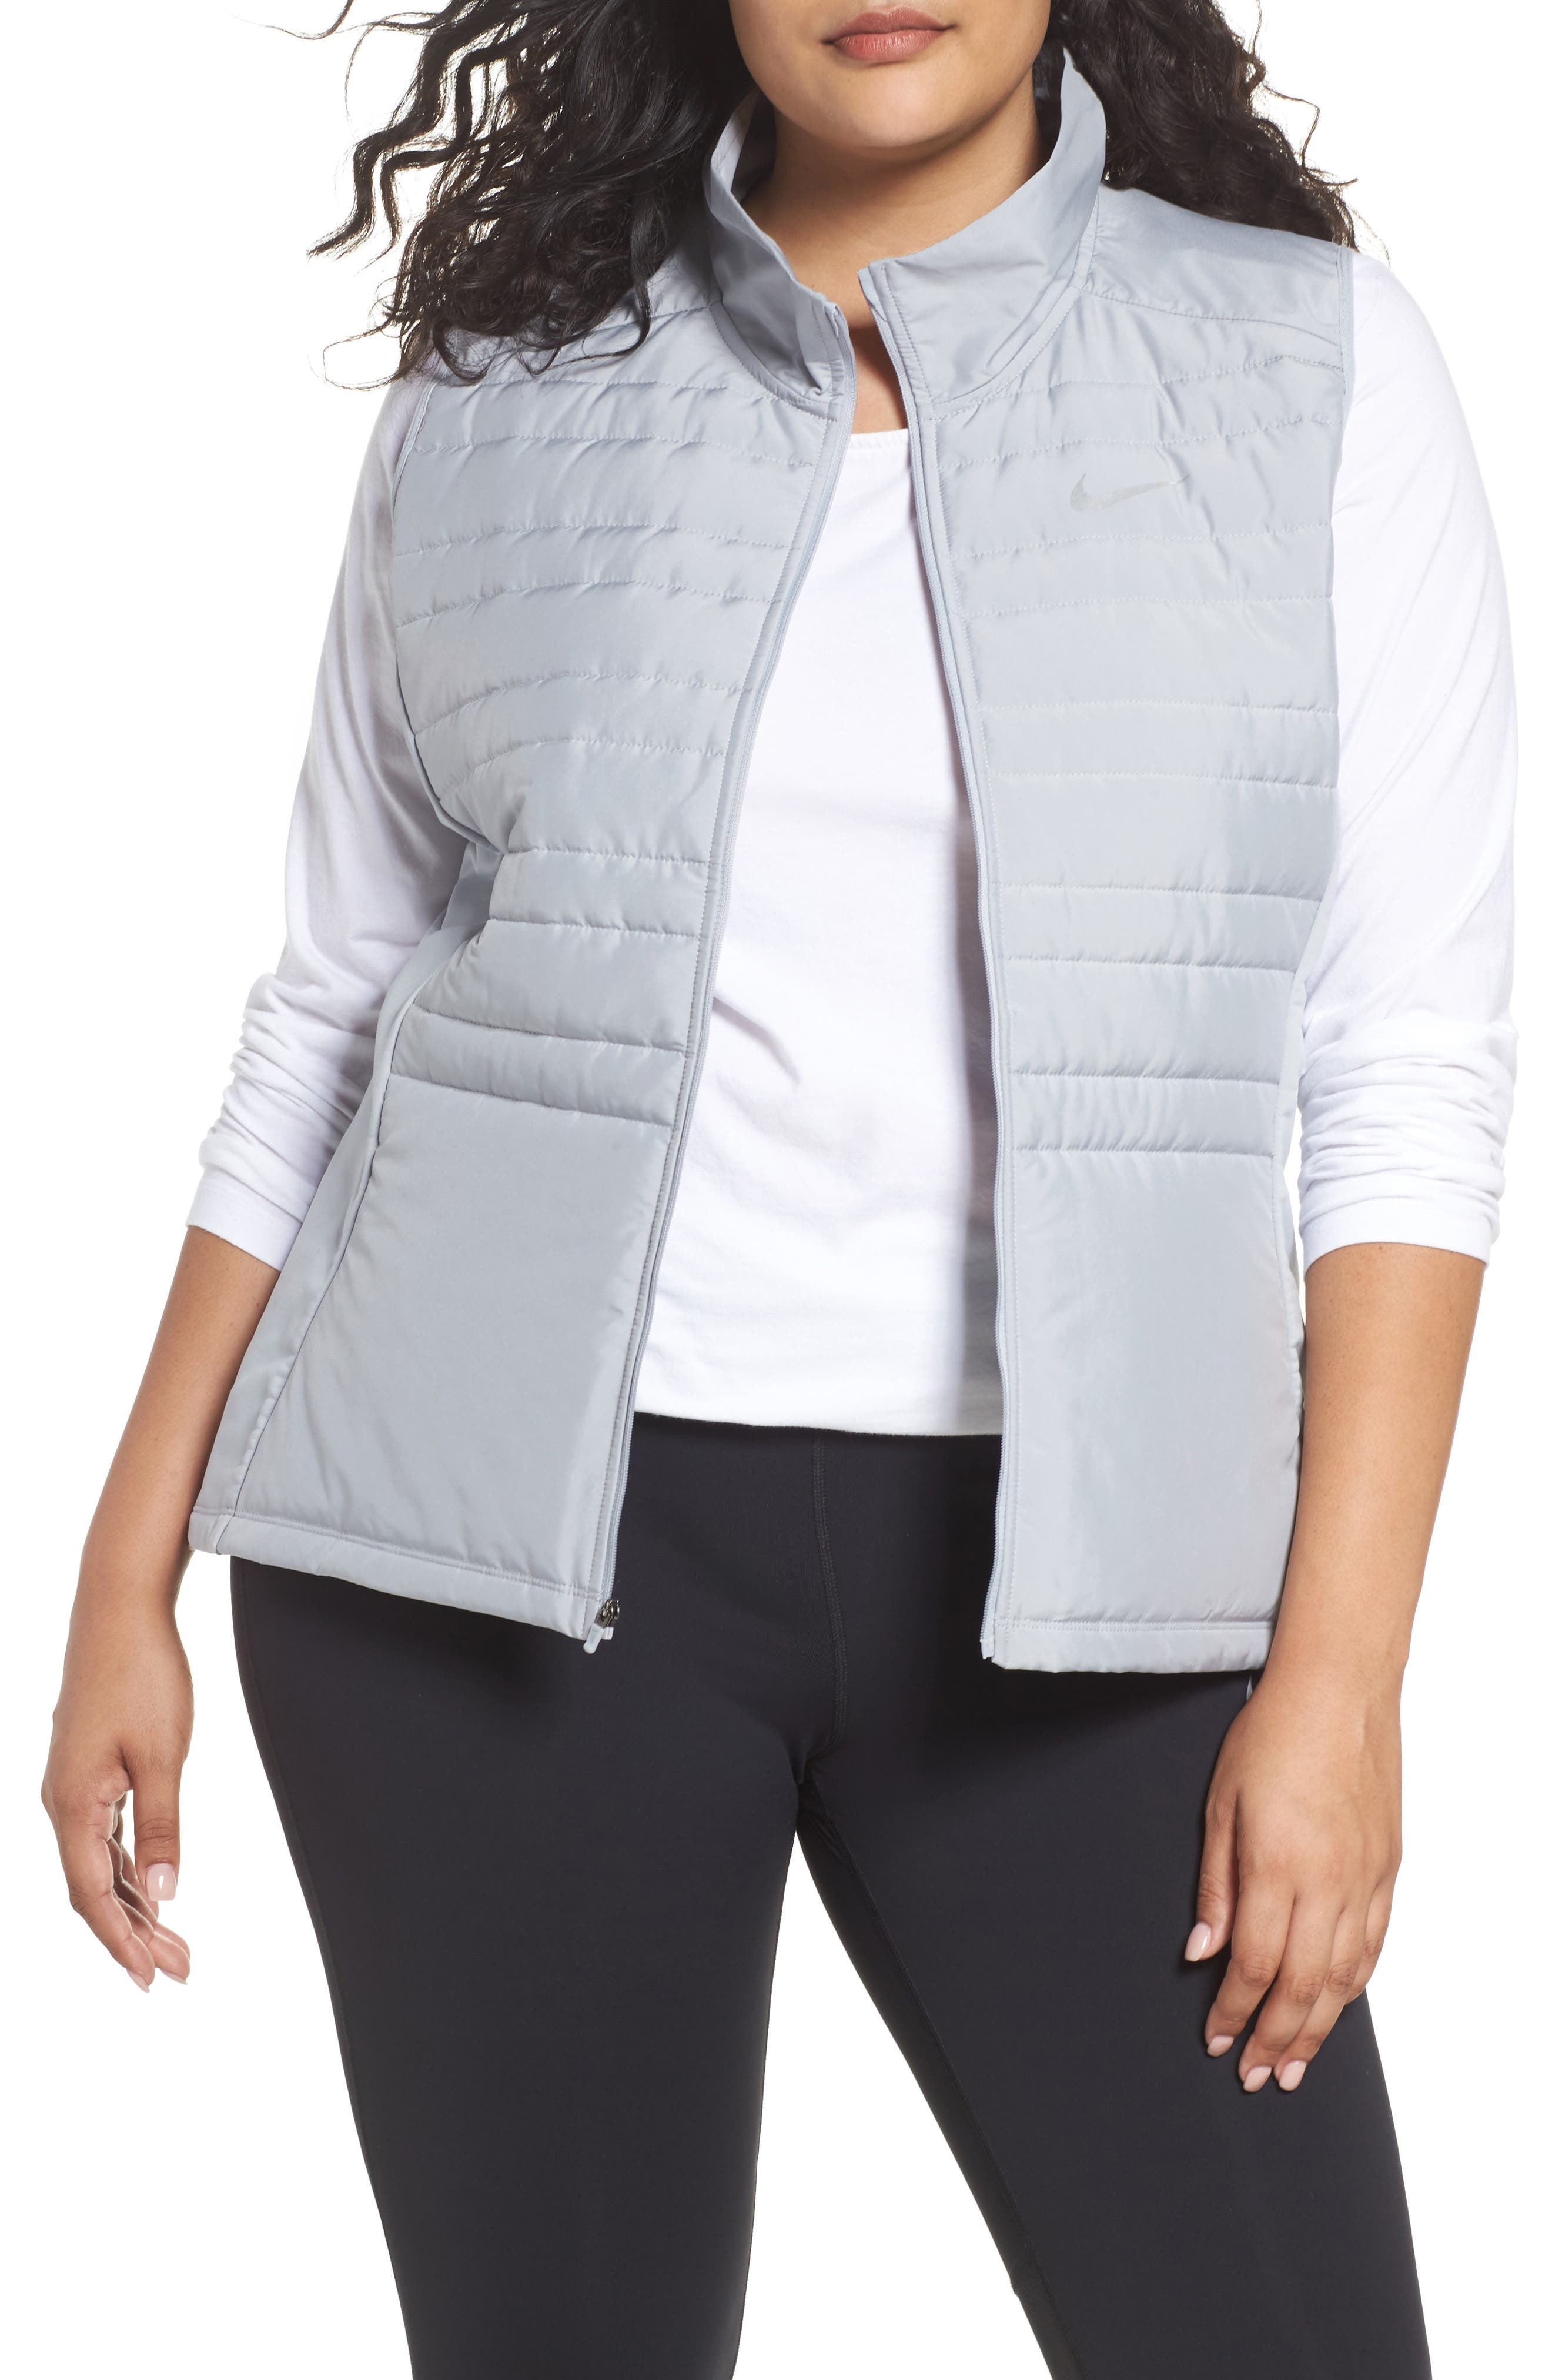 Essentials Running Vest,                             Main thumbnail 1, color,                             Wolf Grey/ Metallic Silver